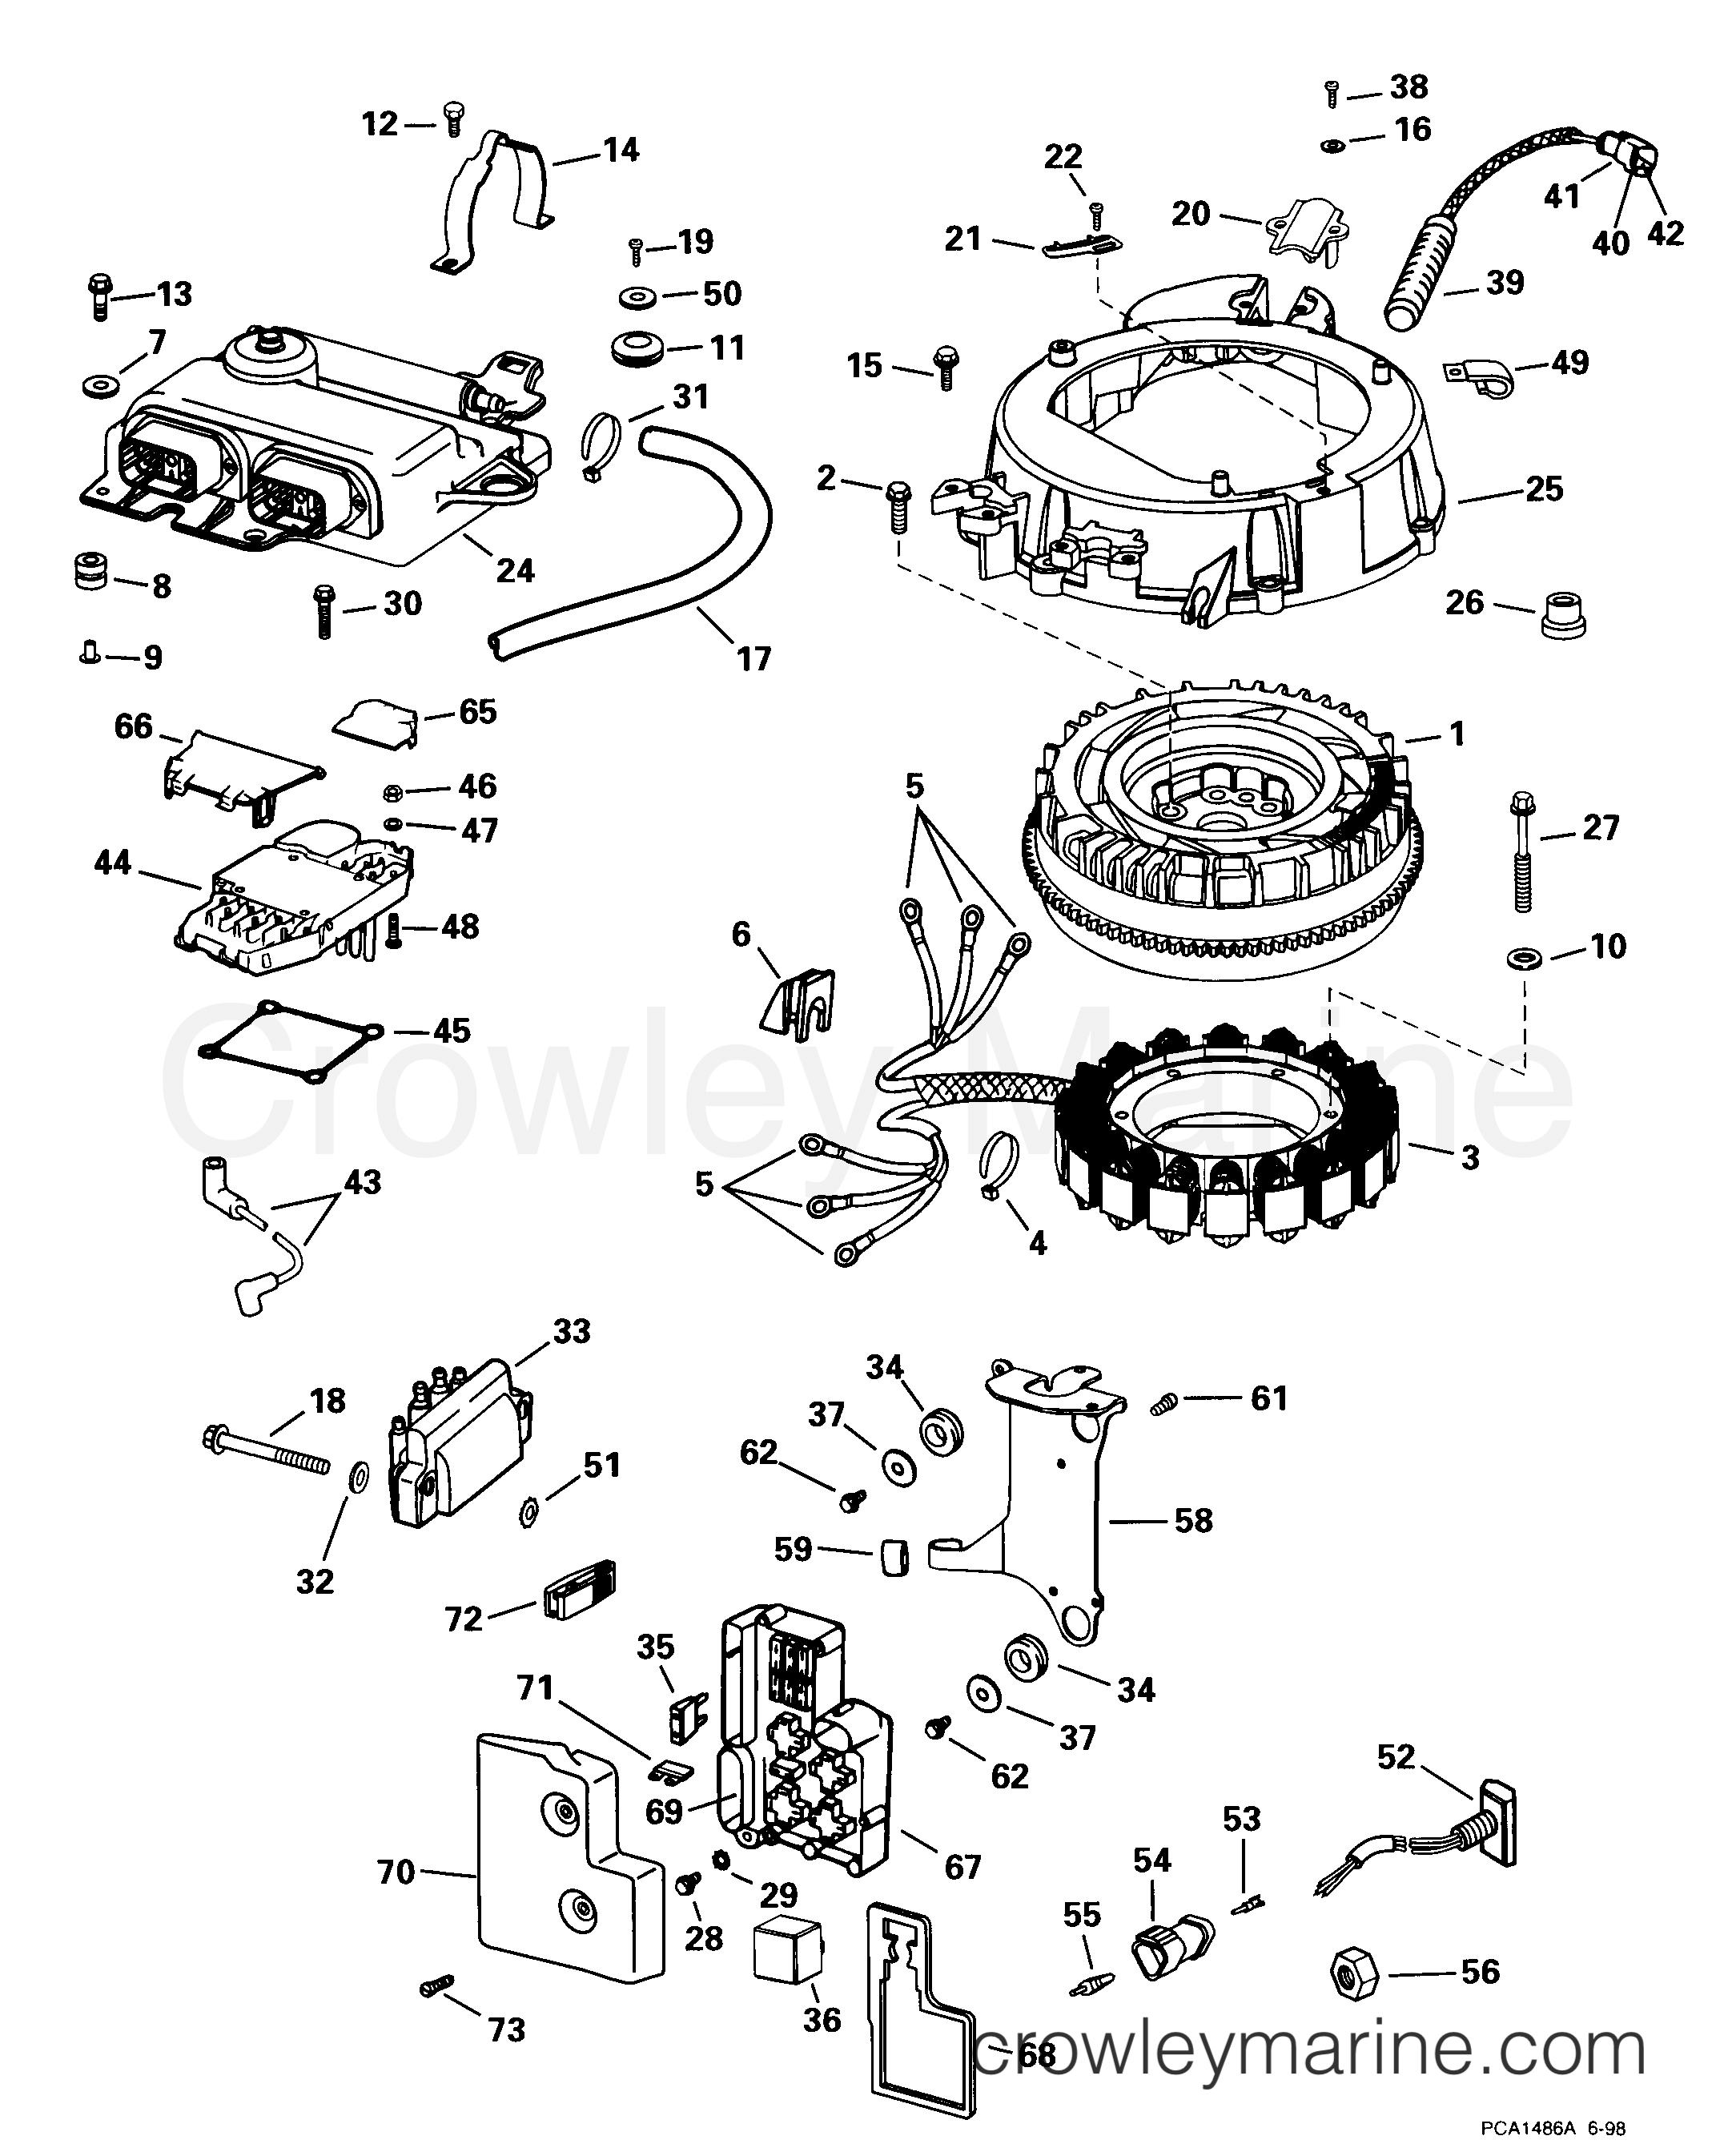 1999 115 Evinrude Rectifier Wiring Diagrams    Wiring Diagram